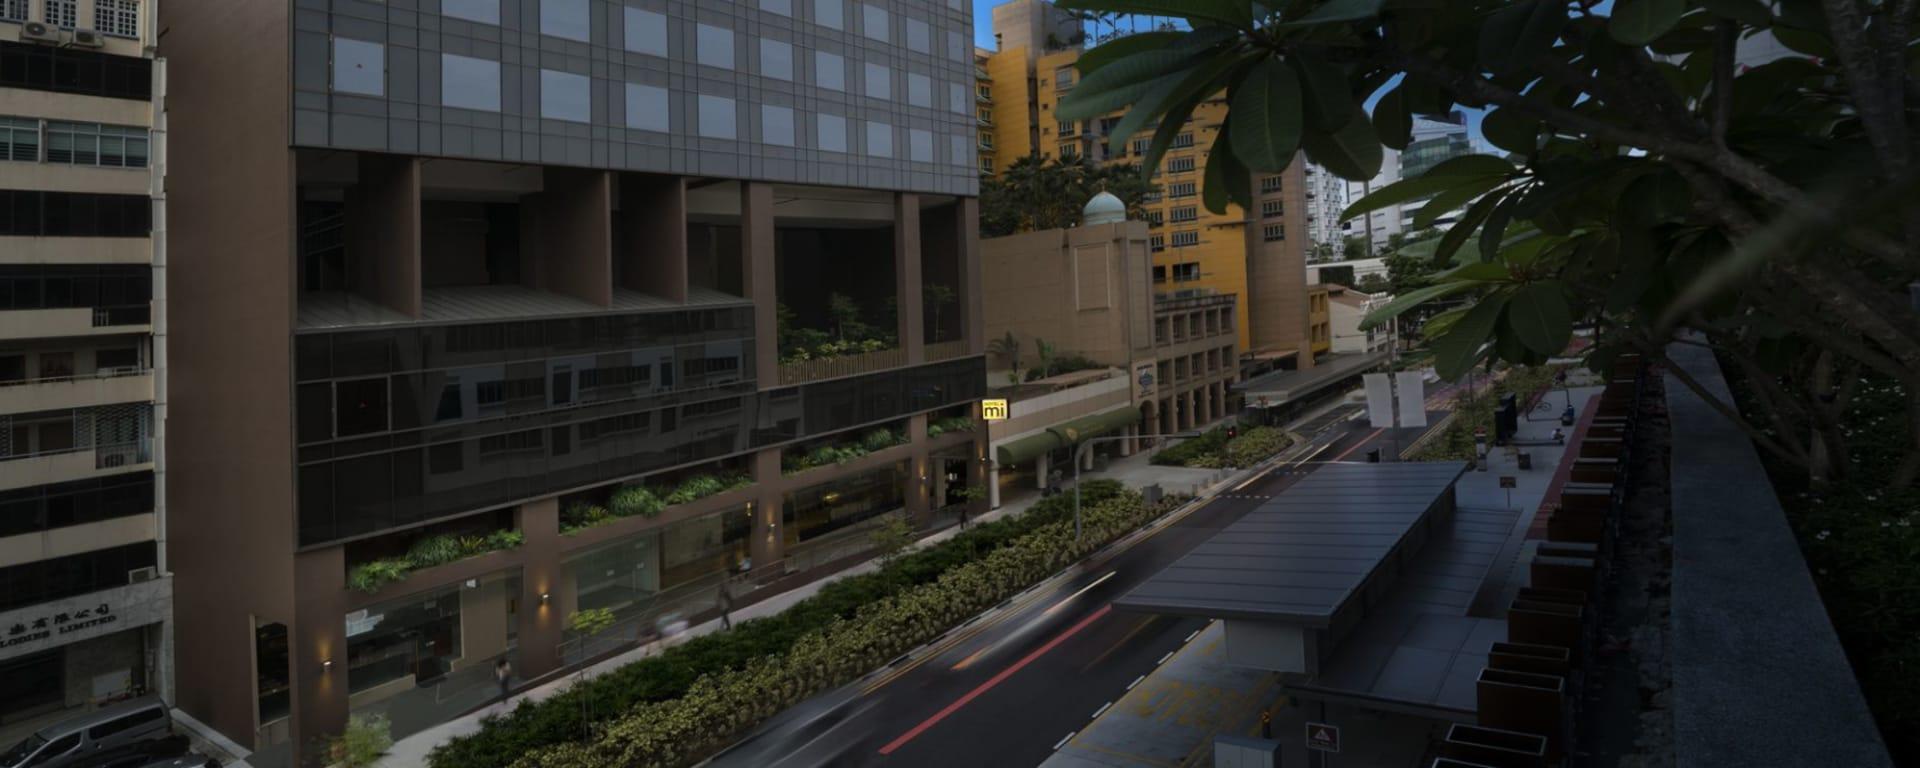 Hotel Mi in Singapur: Hotel building